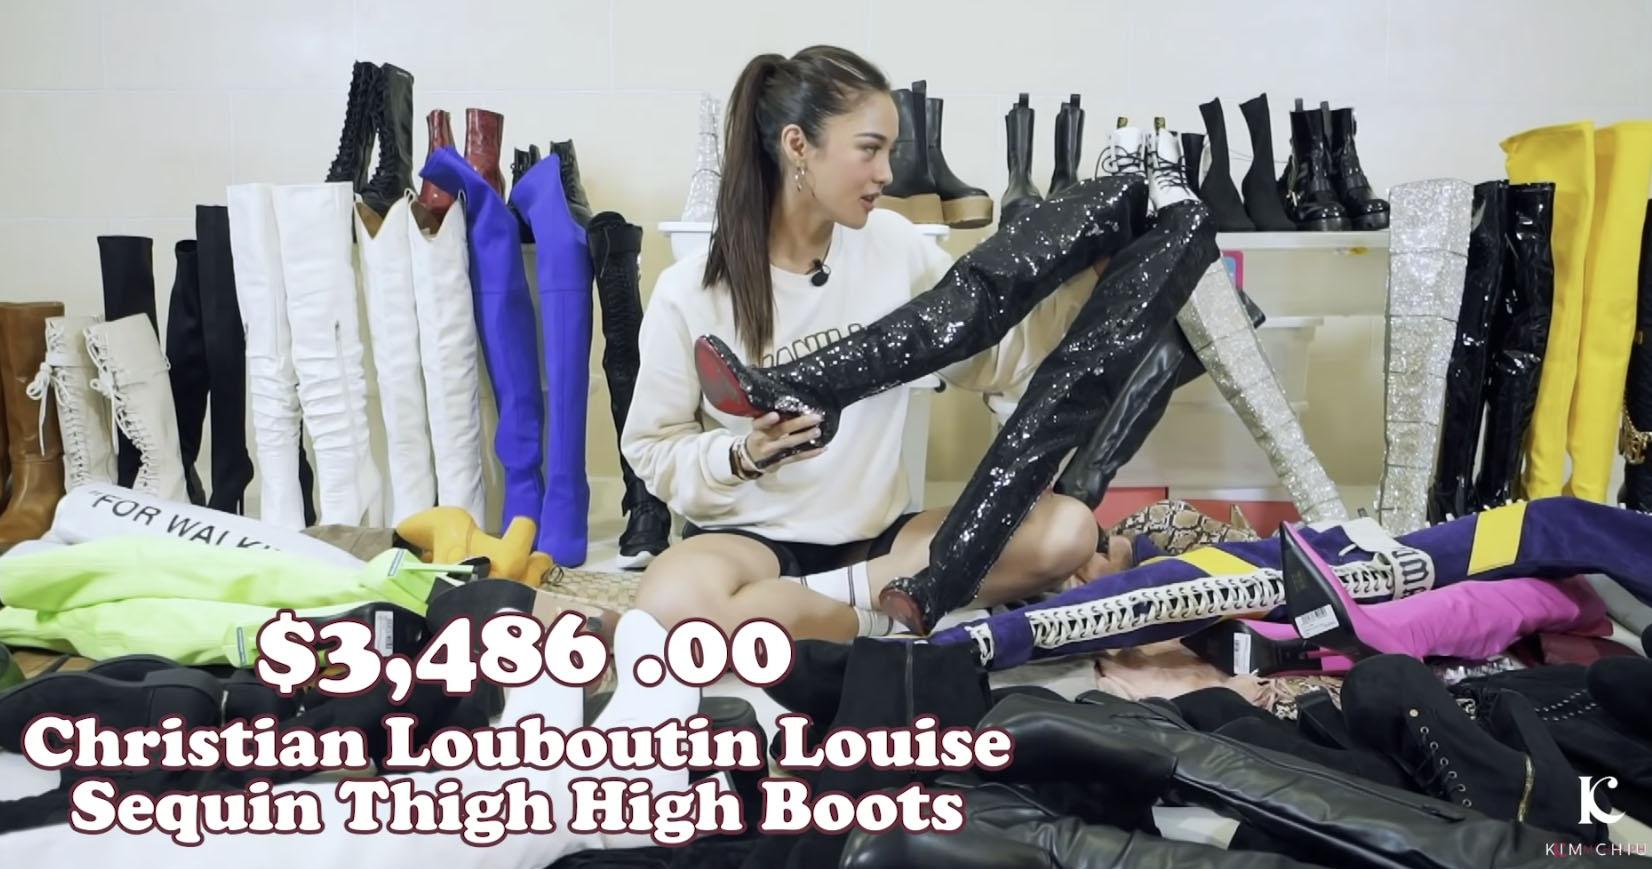 Youtube Vlog Screengrab: Kim Chiu Christian Louboutin Louise sequin thigh-high boots